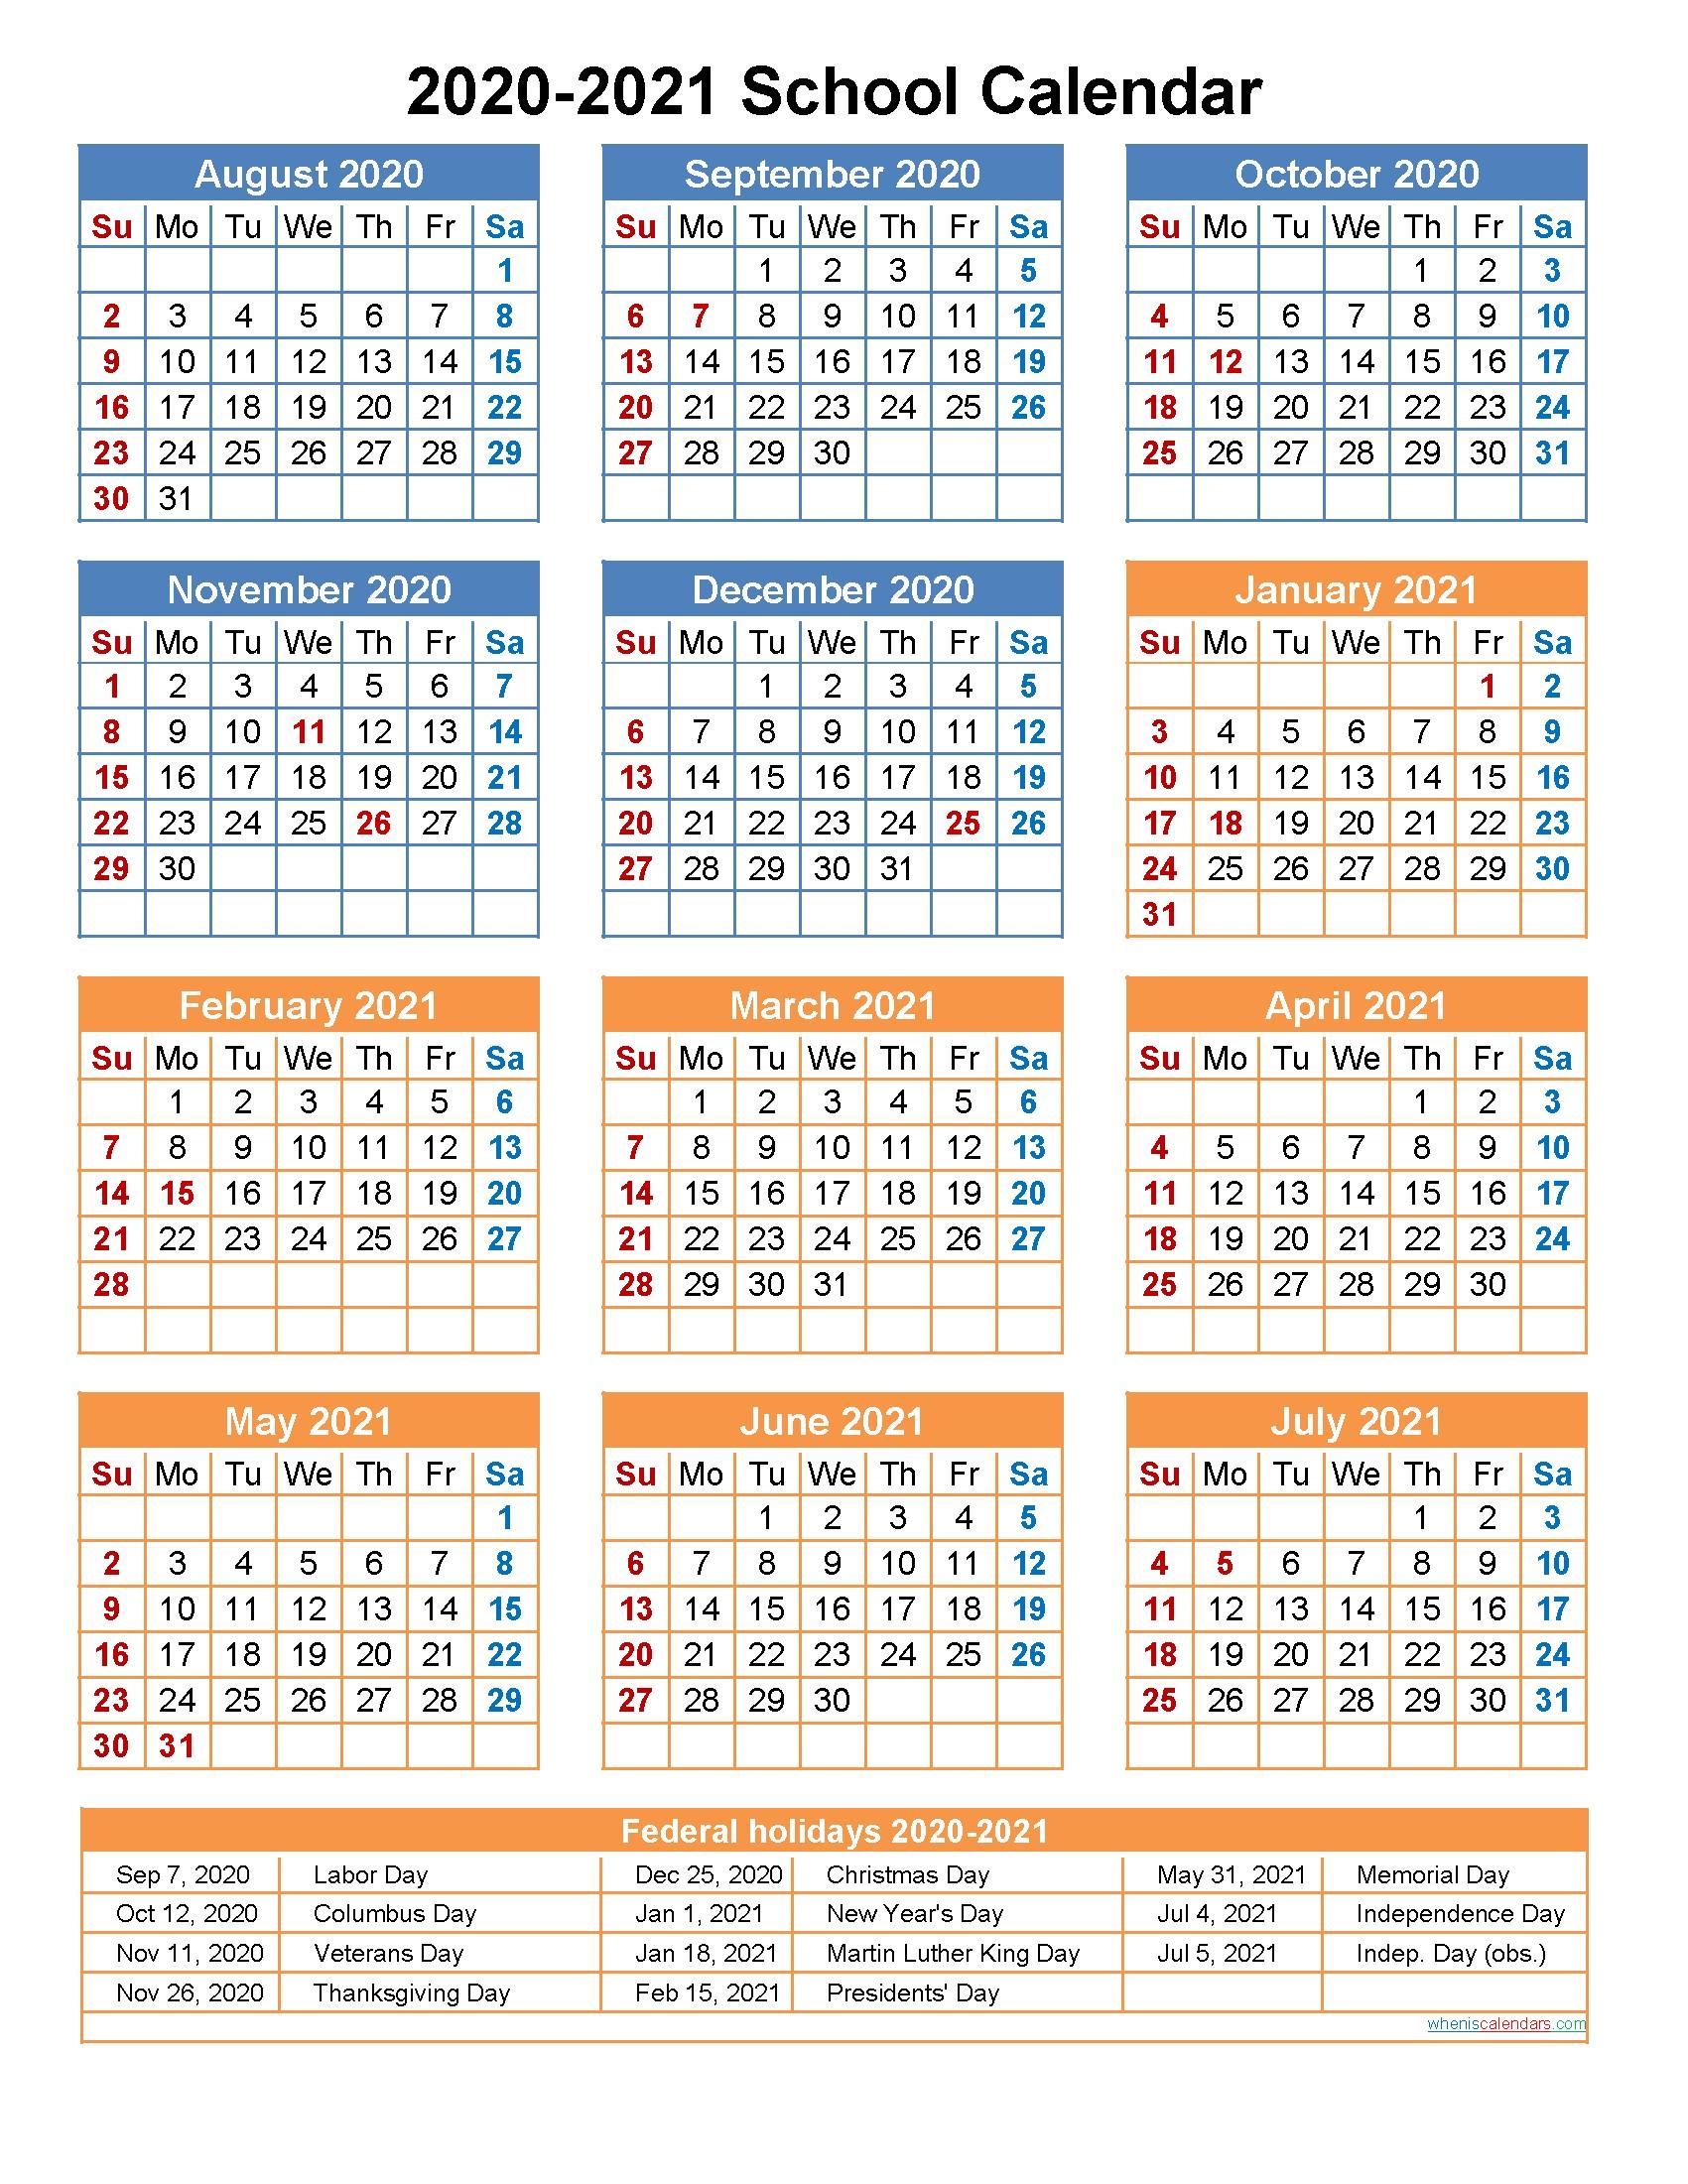 004 Best School Year Calendar Template Example  Excel 2019-20 WordFull